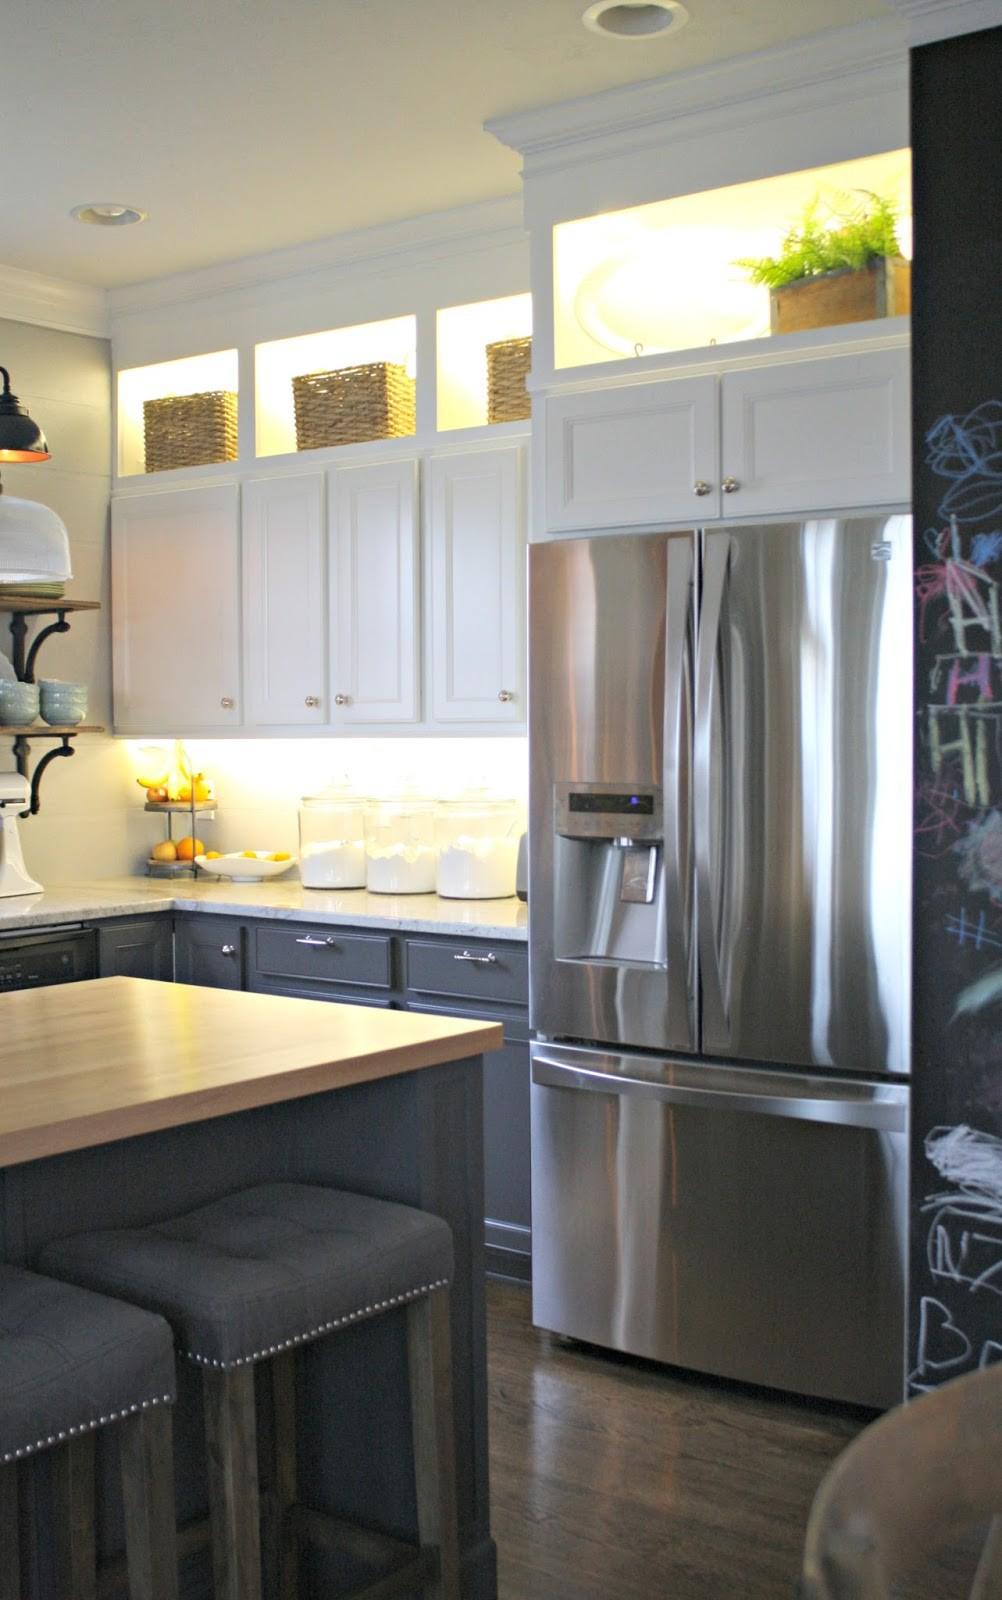 7. Easy DIY Kitchen Cabinet Lighting